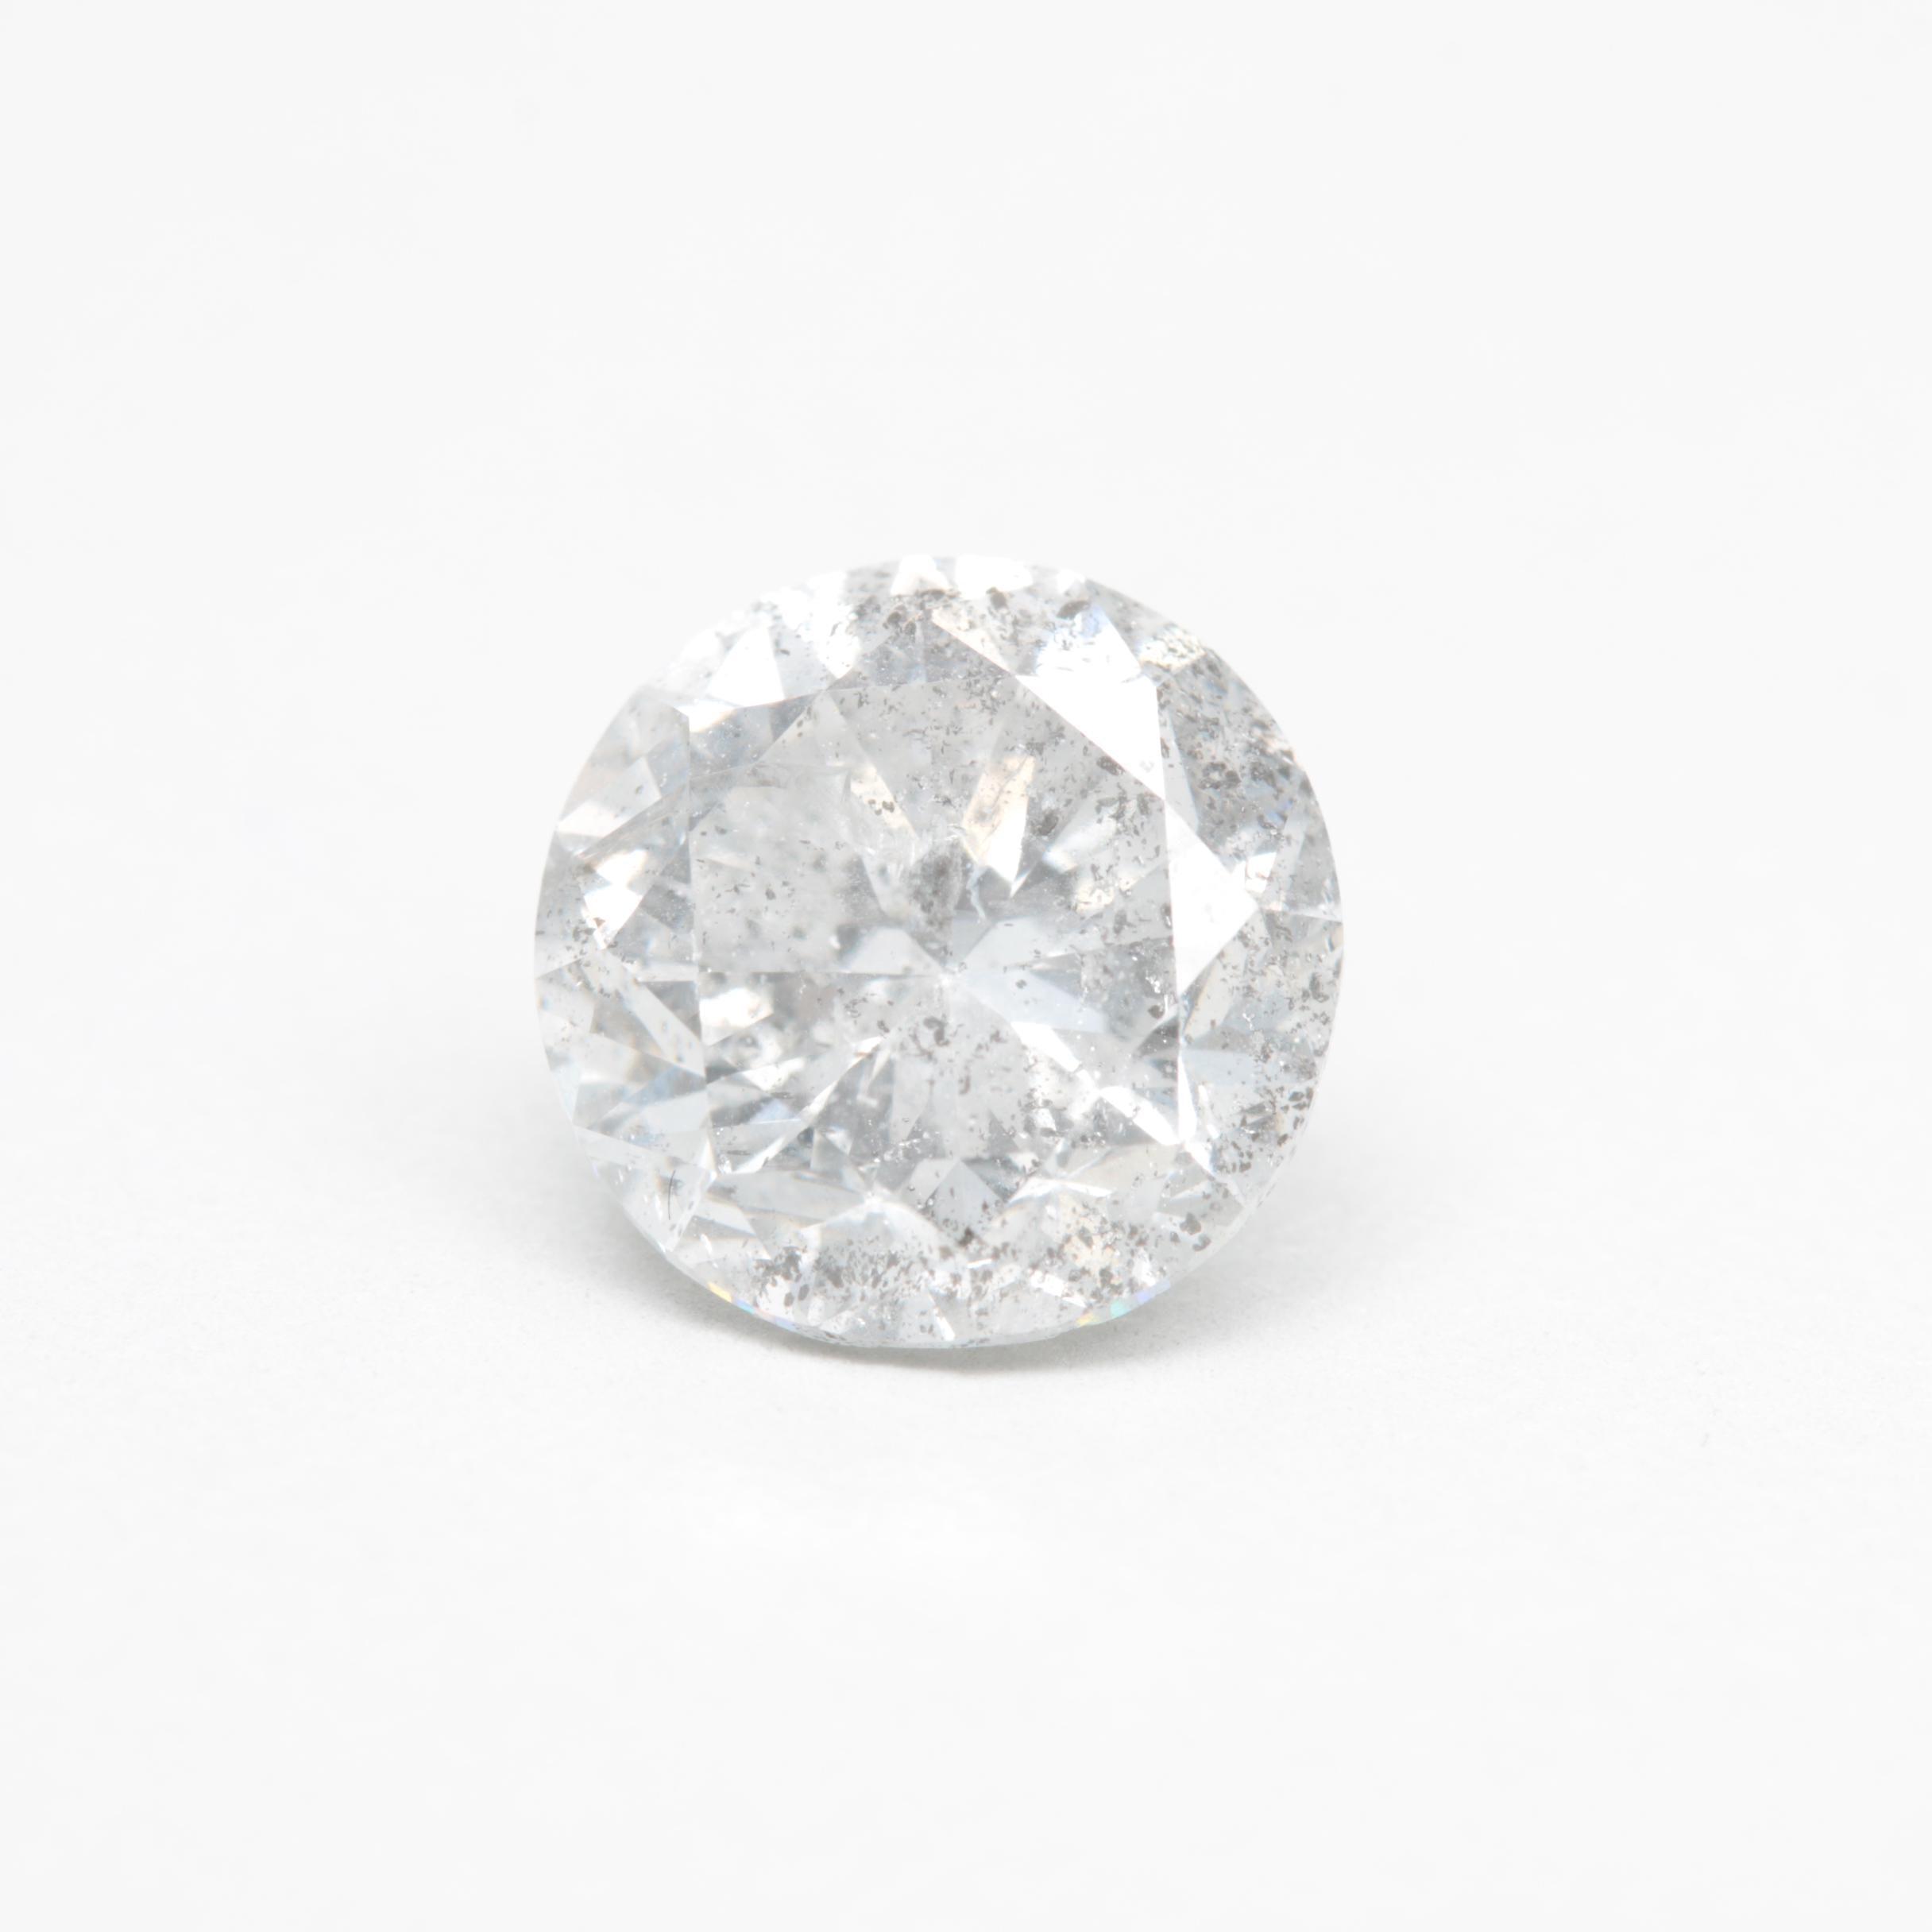 Loose 2.01 CT Diamond